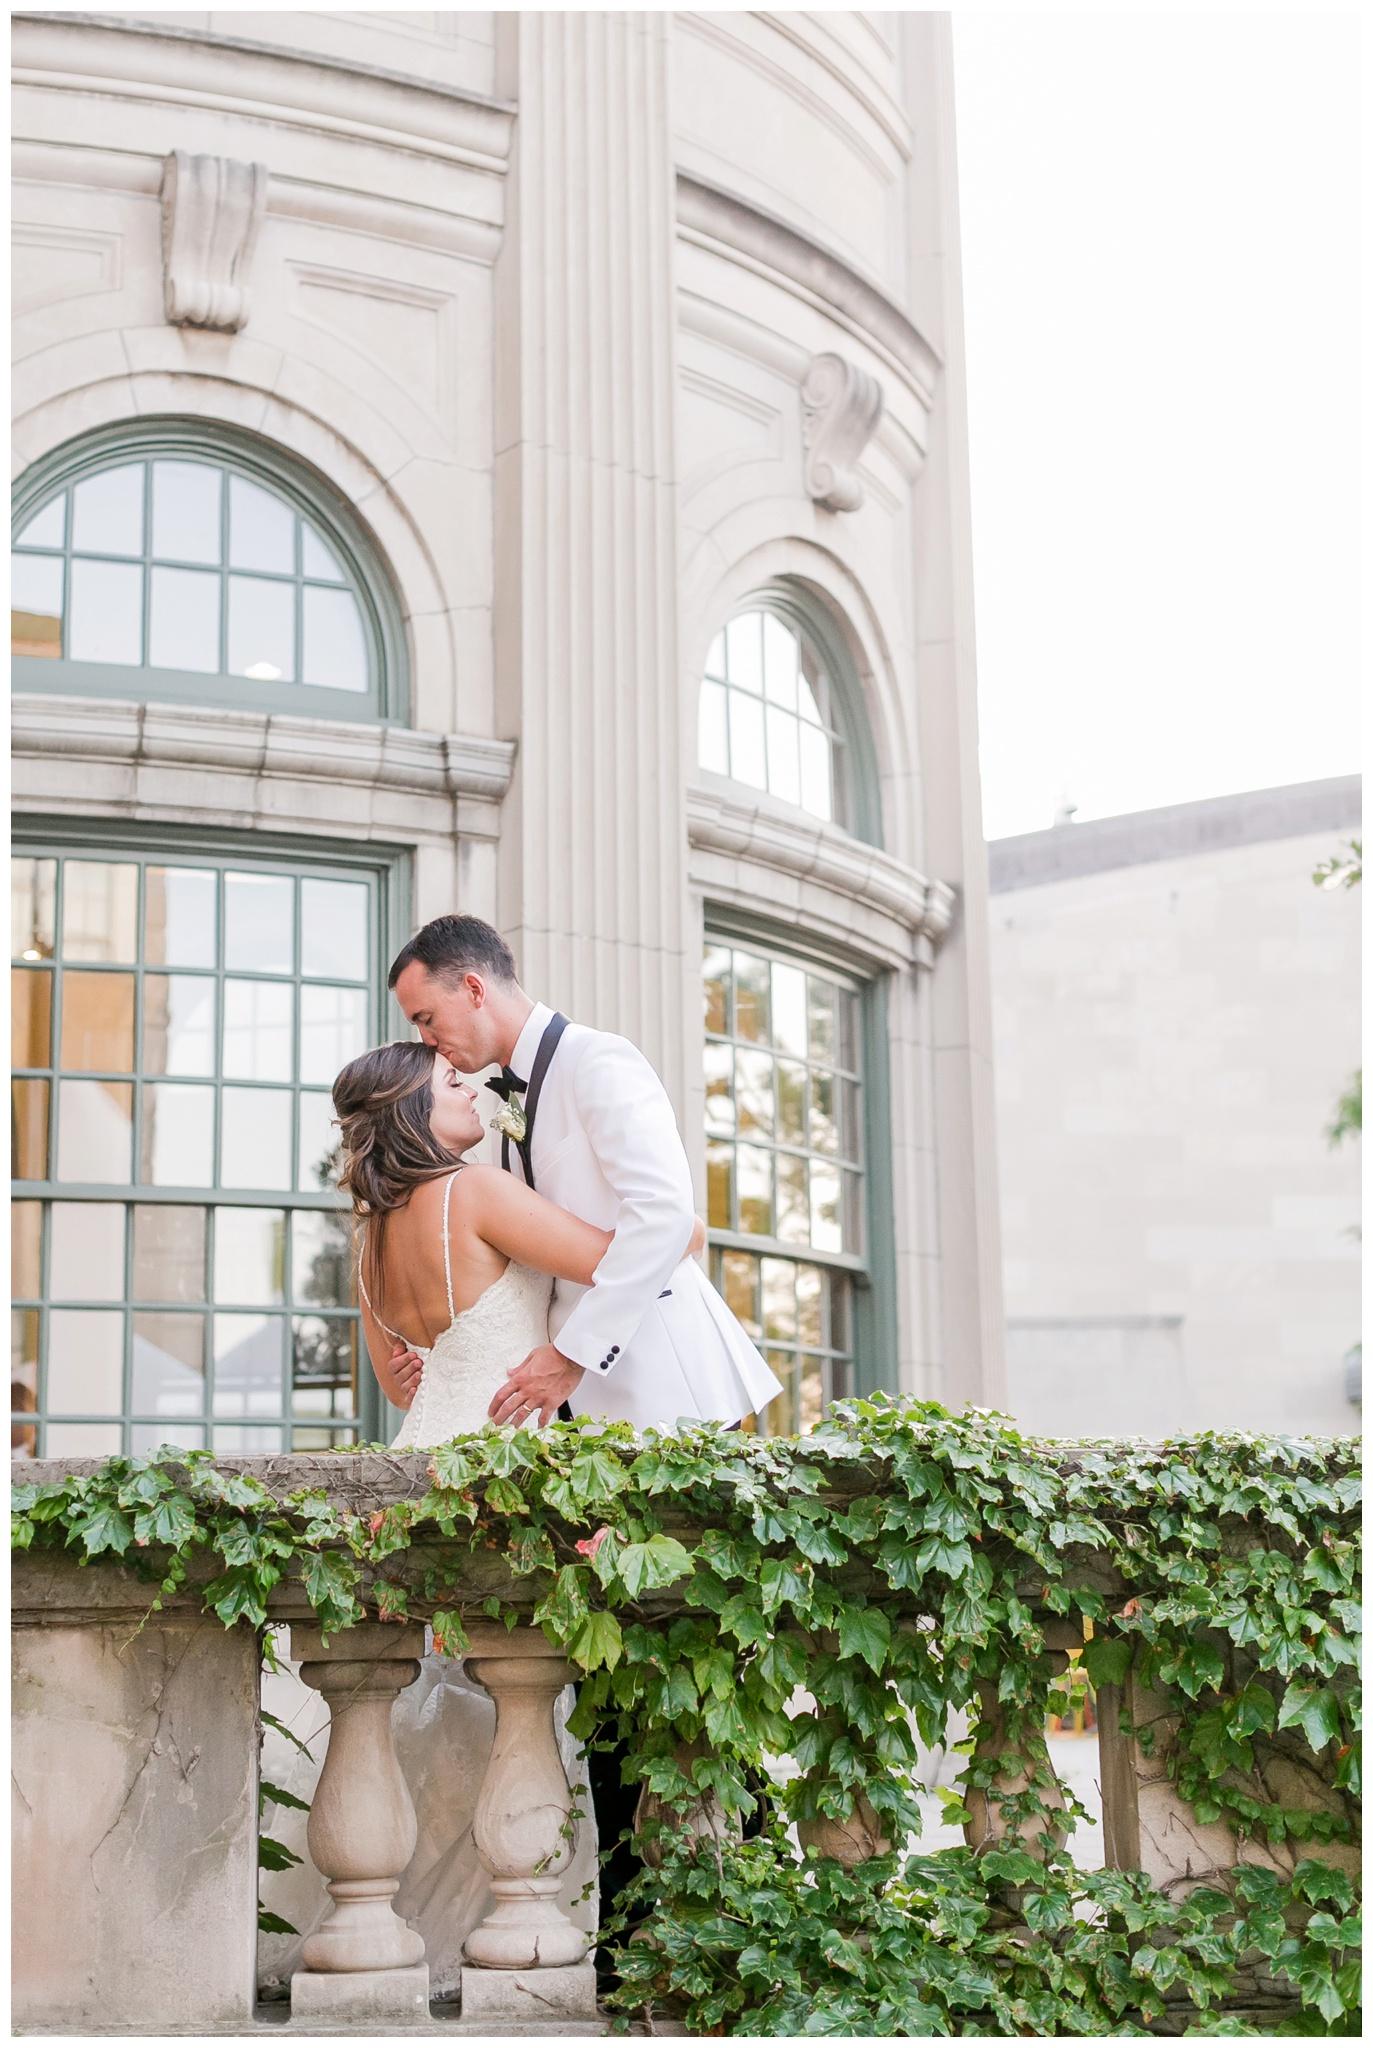 UW_Memorial_Union_wedding_madison_wisconsin_wedding_photographers_4644.jpg